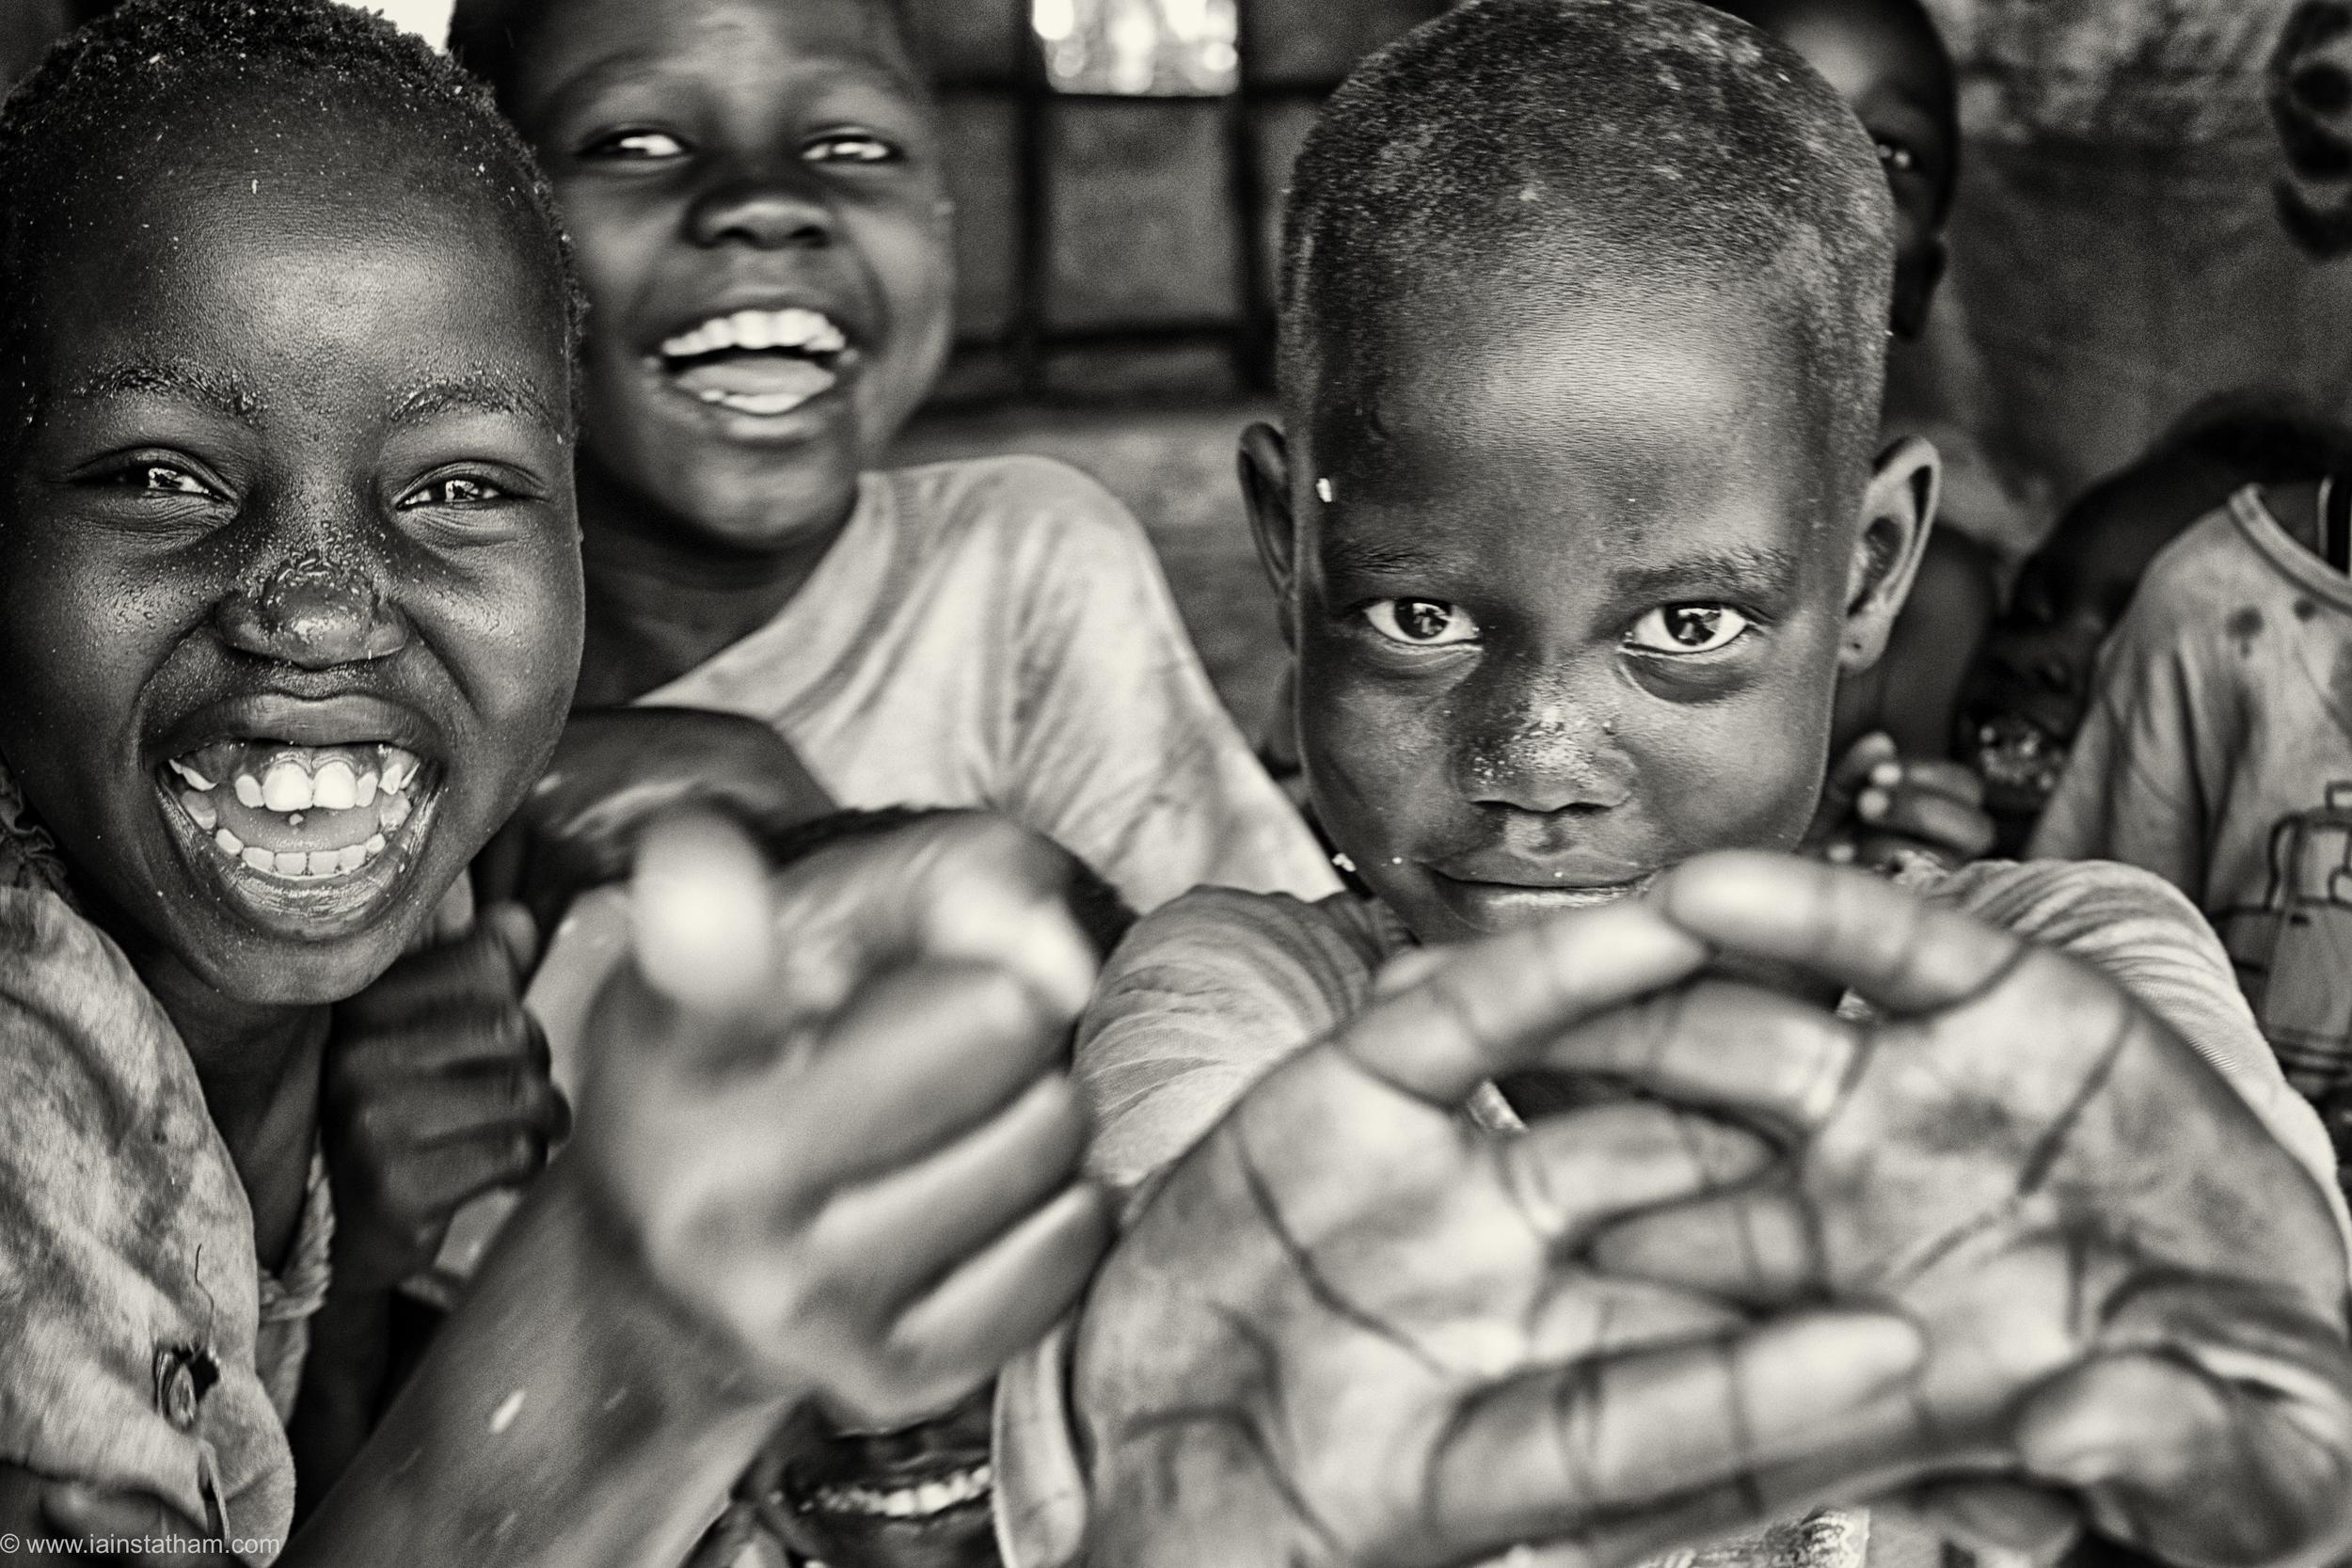 ug - south sudan refugees - dziapi - bw-21.jpg